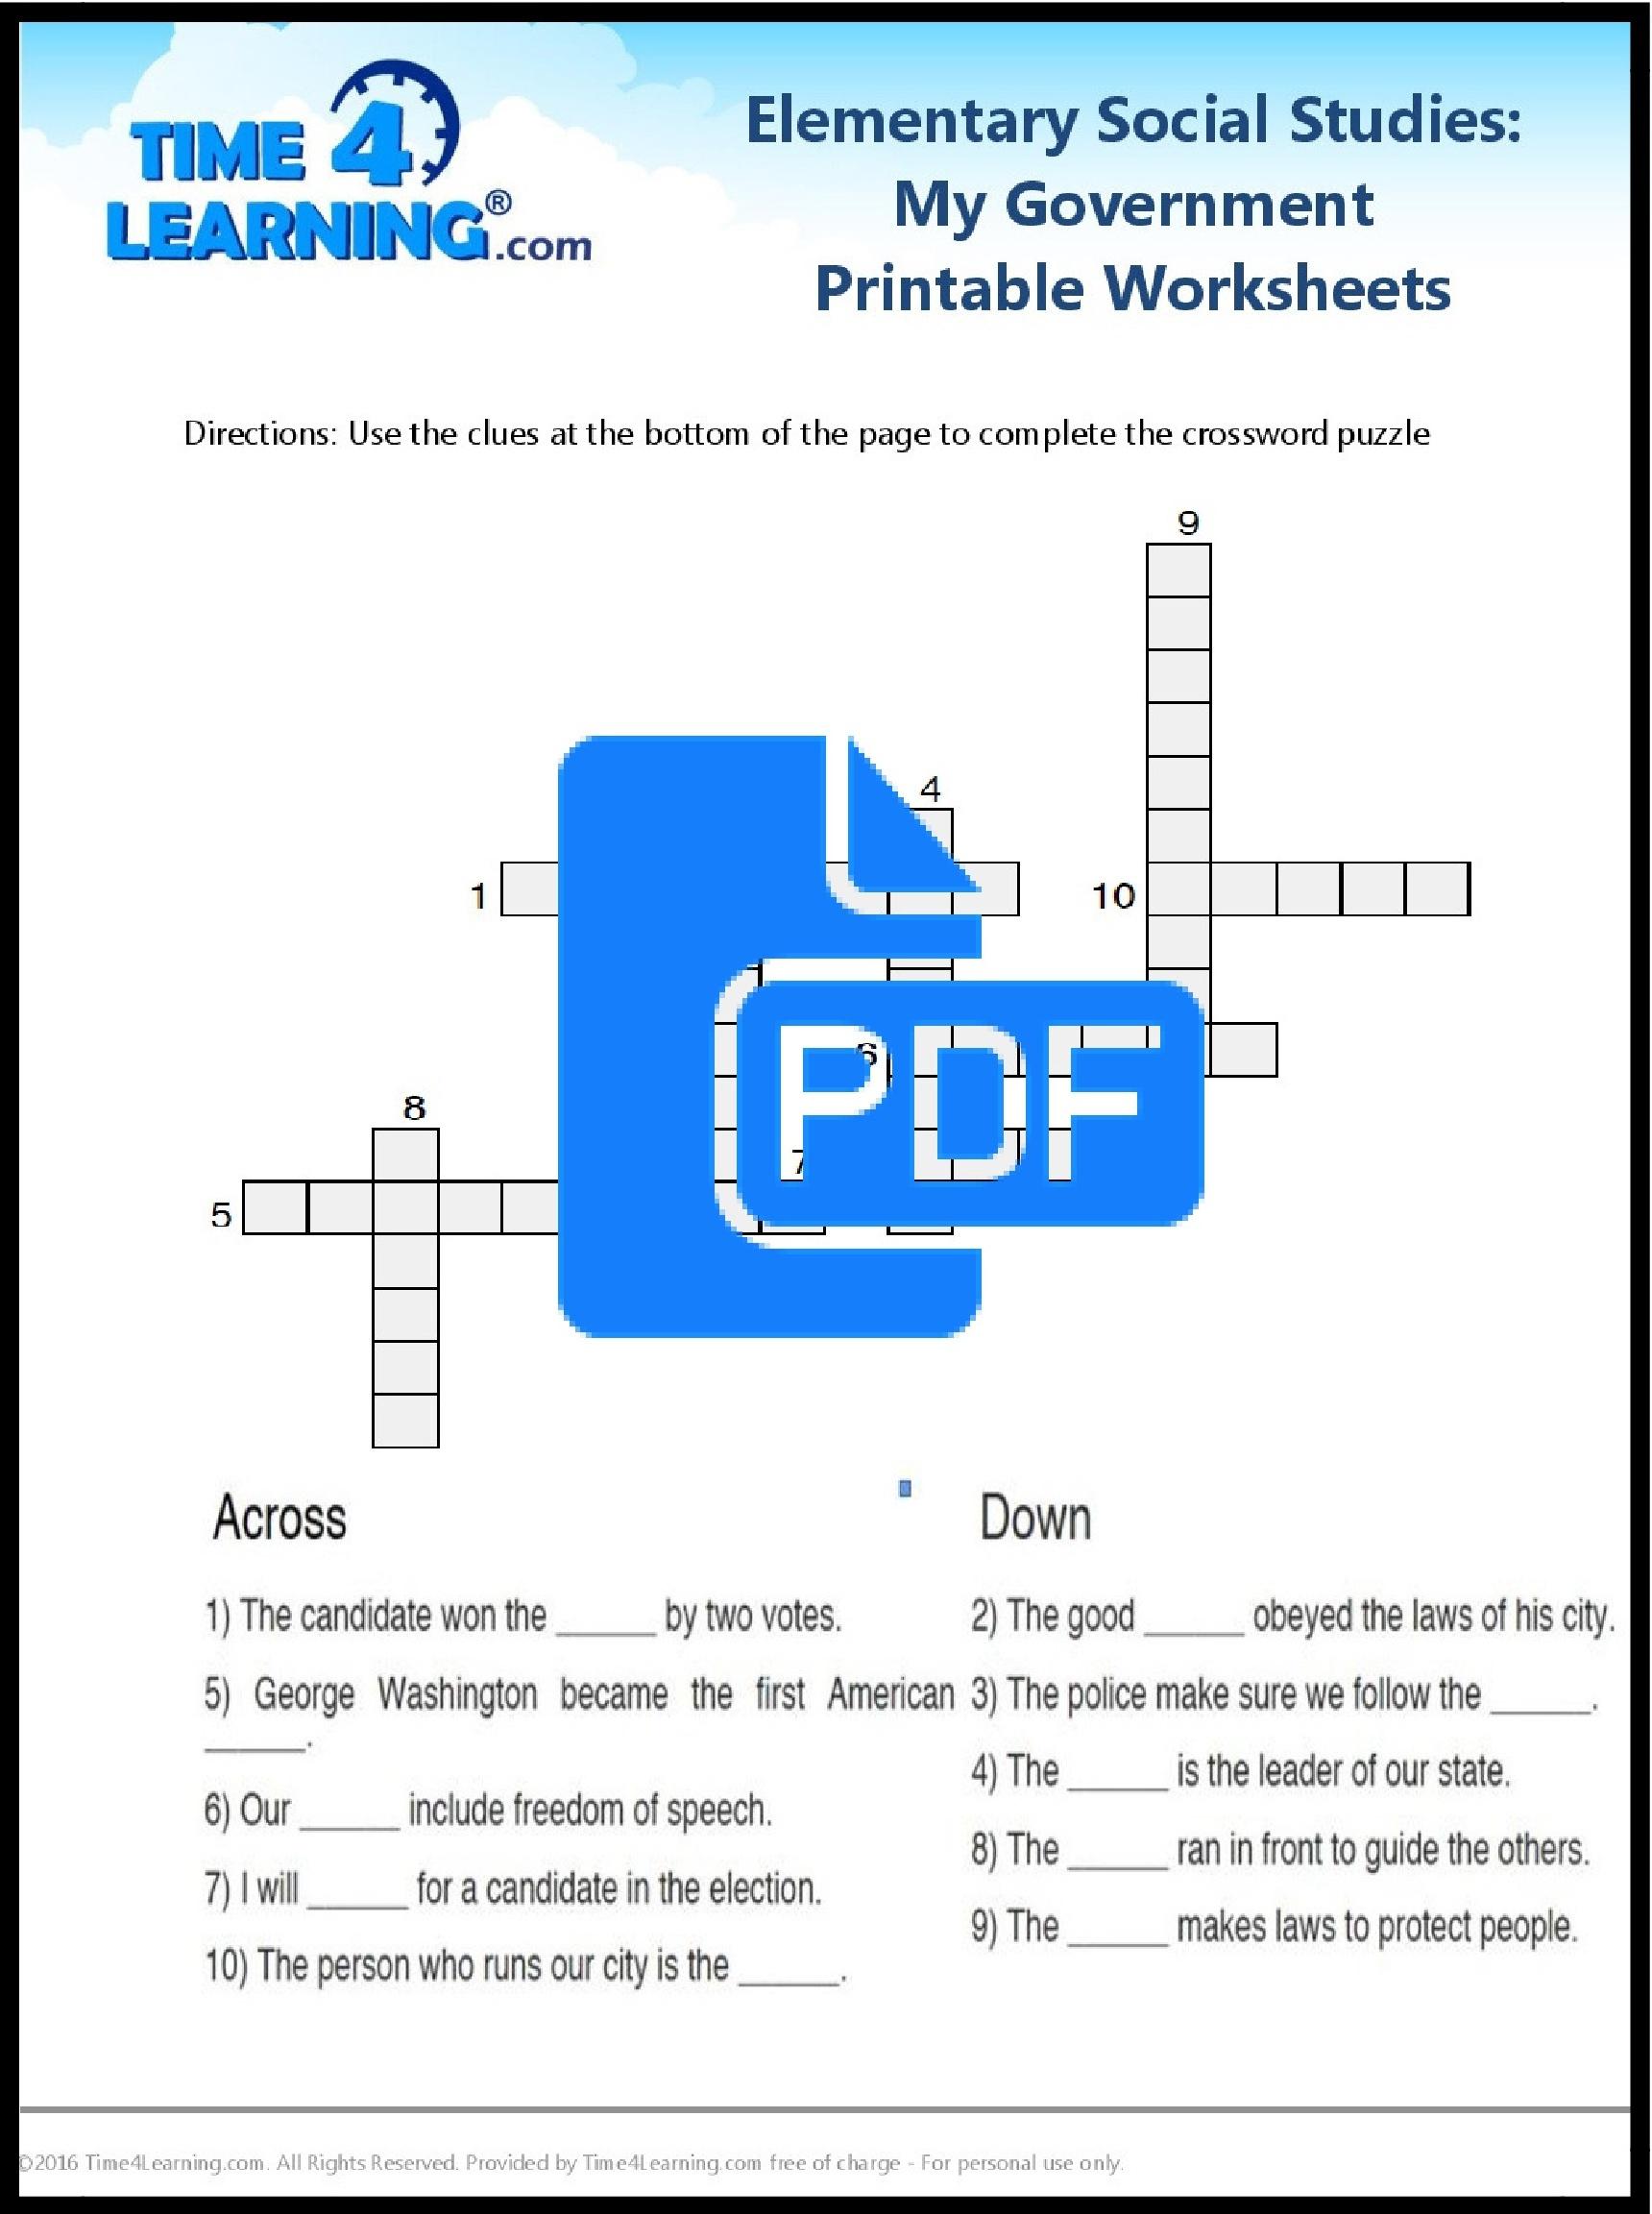 Free Printable: Elementary Social Studies Worksheet | Time4Learning - Social Studies Worksheets First Grade Free Printable